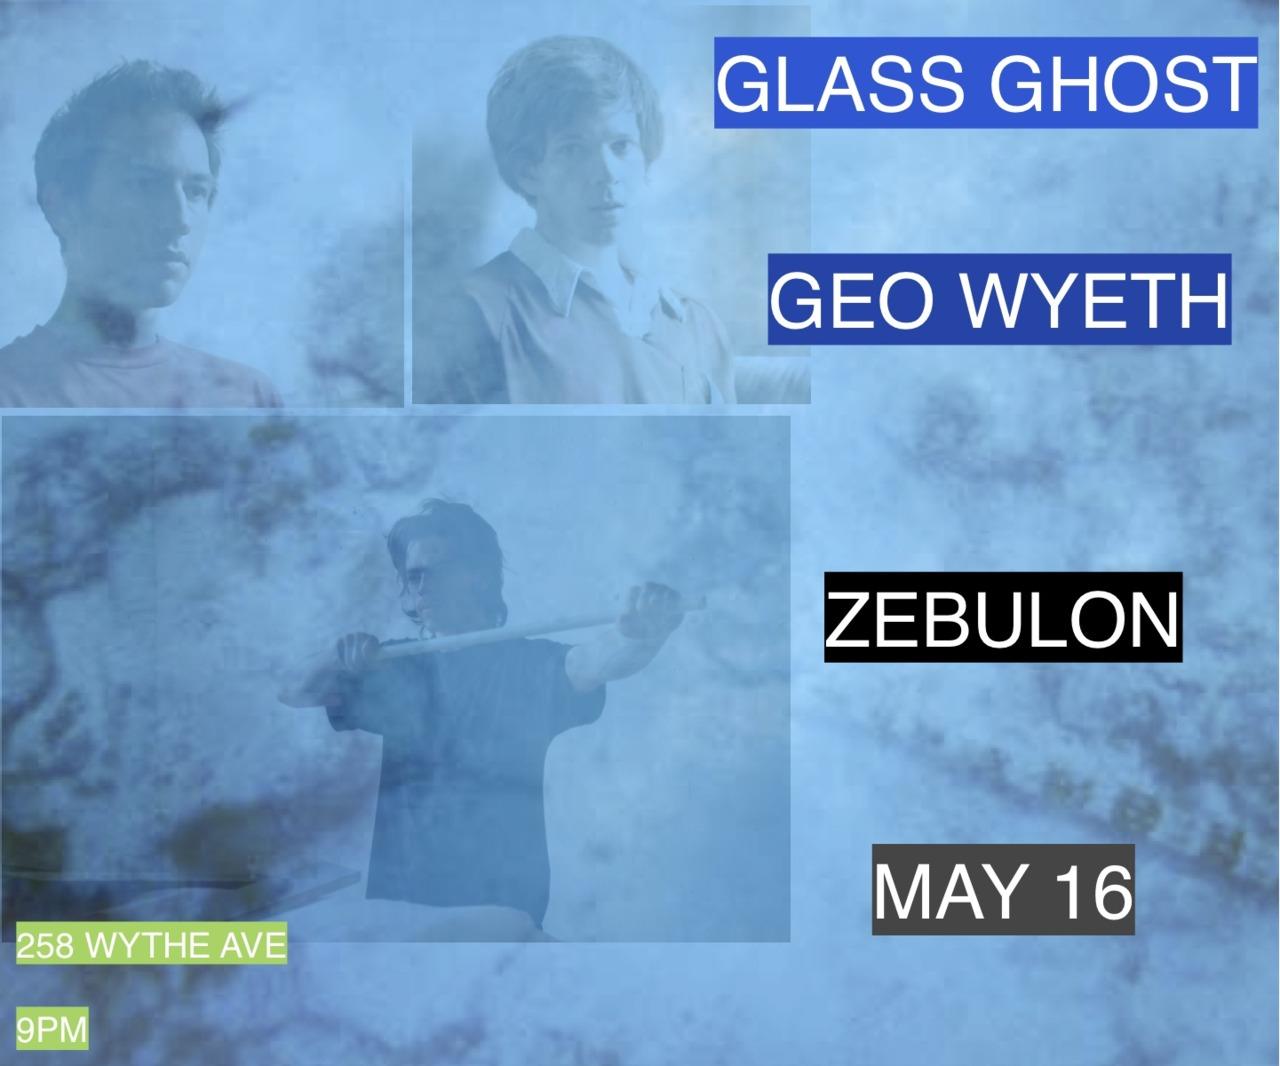 GEO WYETH GLASS GHOST performing at Zebulon on May 16 258 Wythe Avenue Brooklyn 9pm!